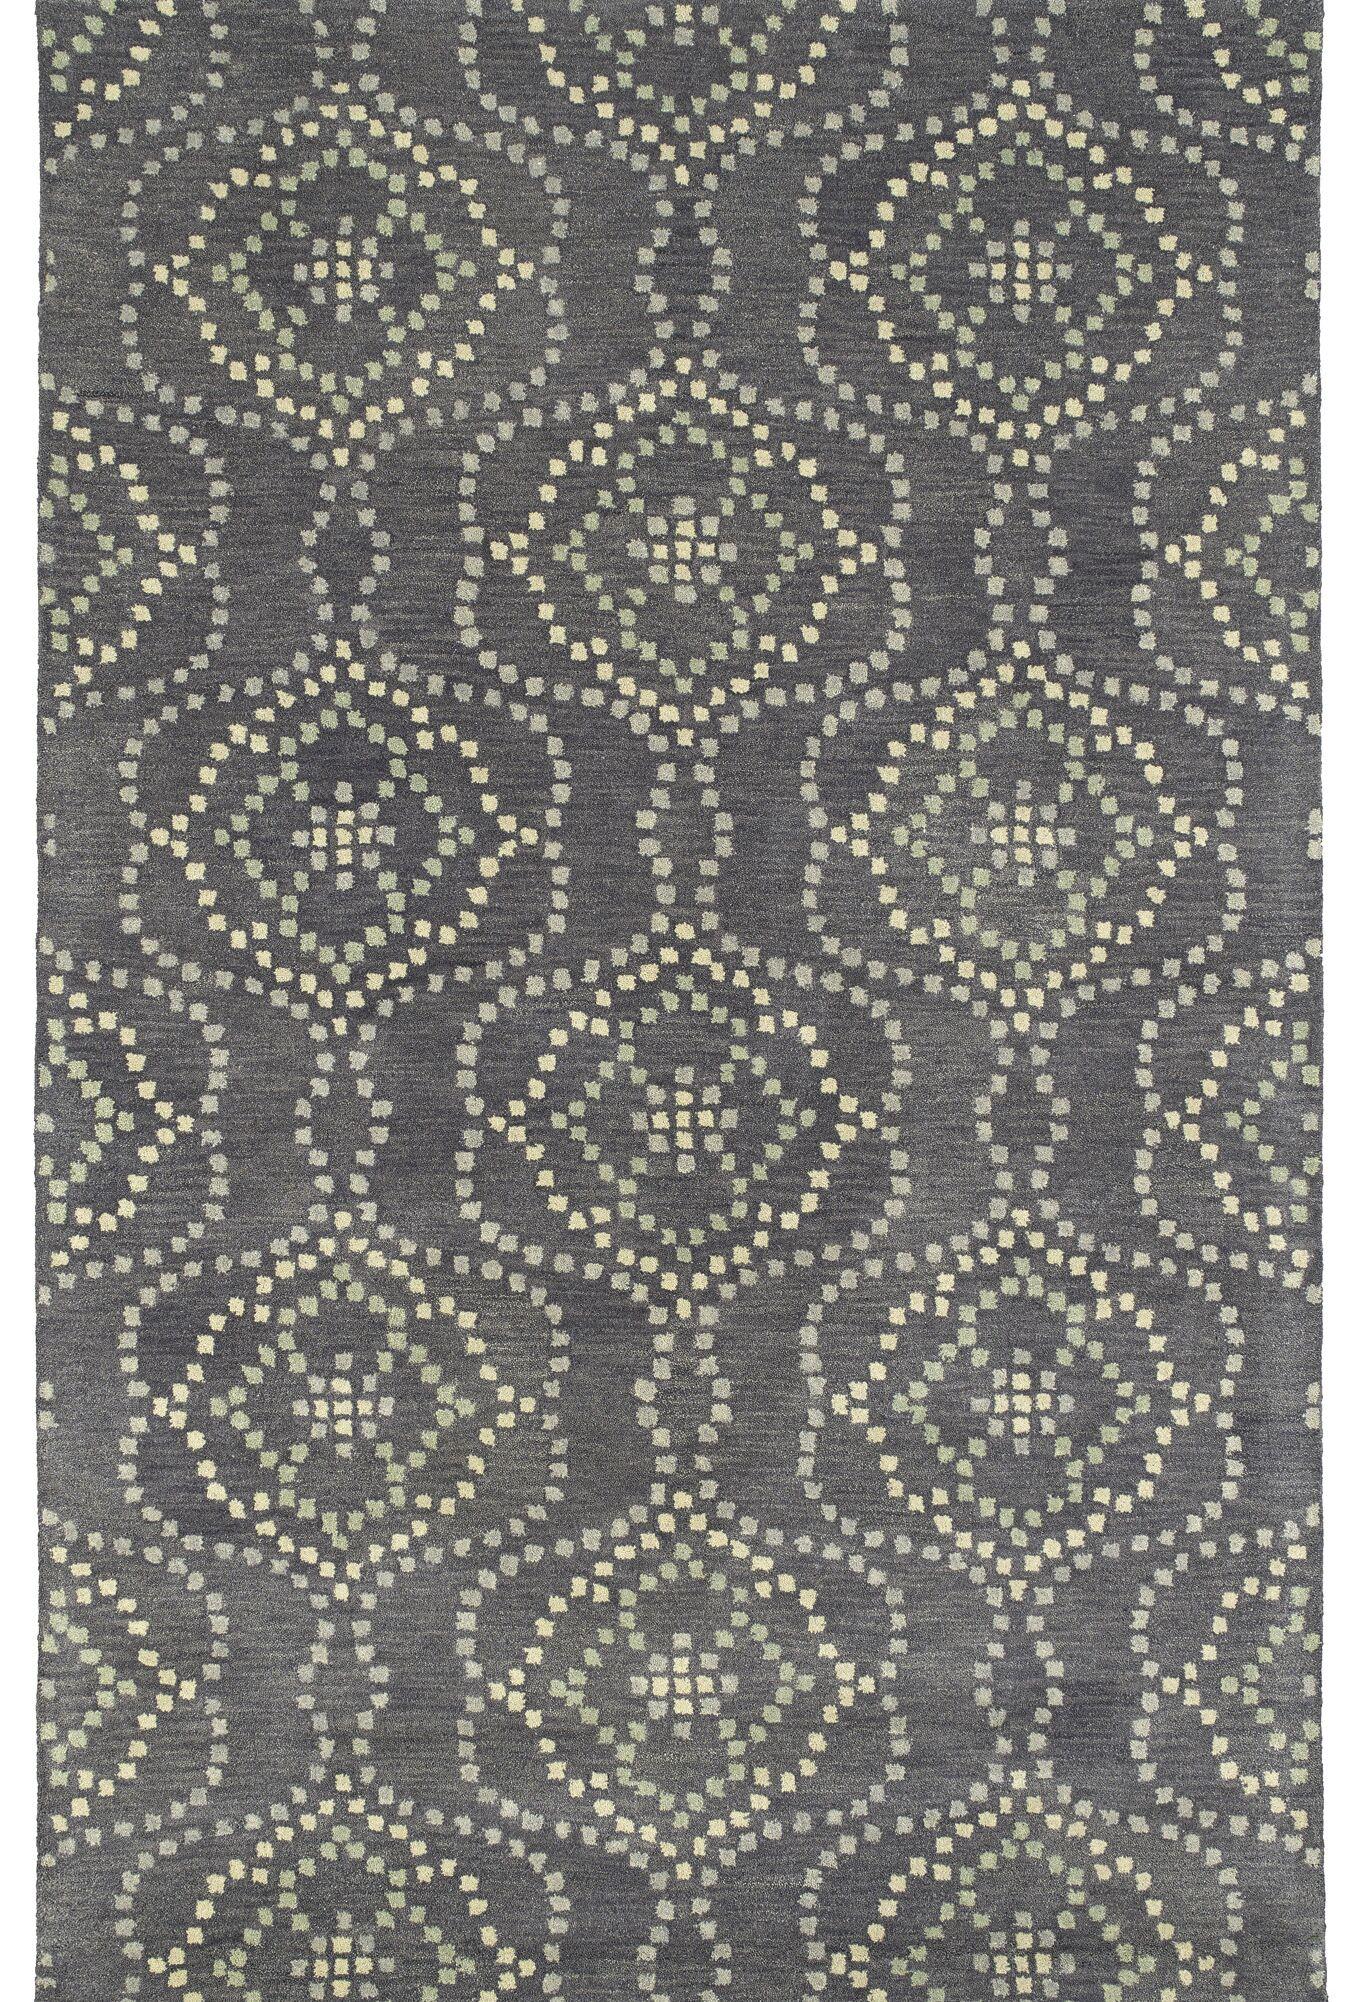 Bergland Hand Tufted Gray/Beige Area Rug Rug Size: Rectangle 3'6